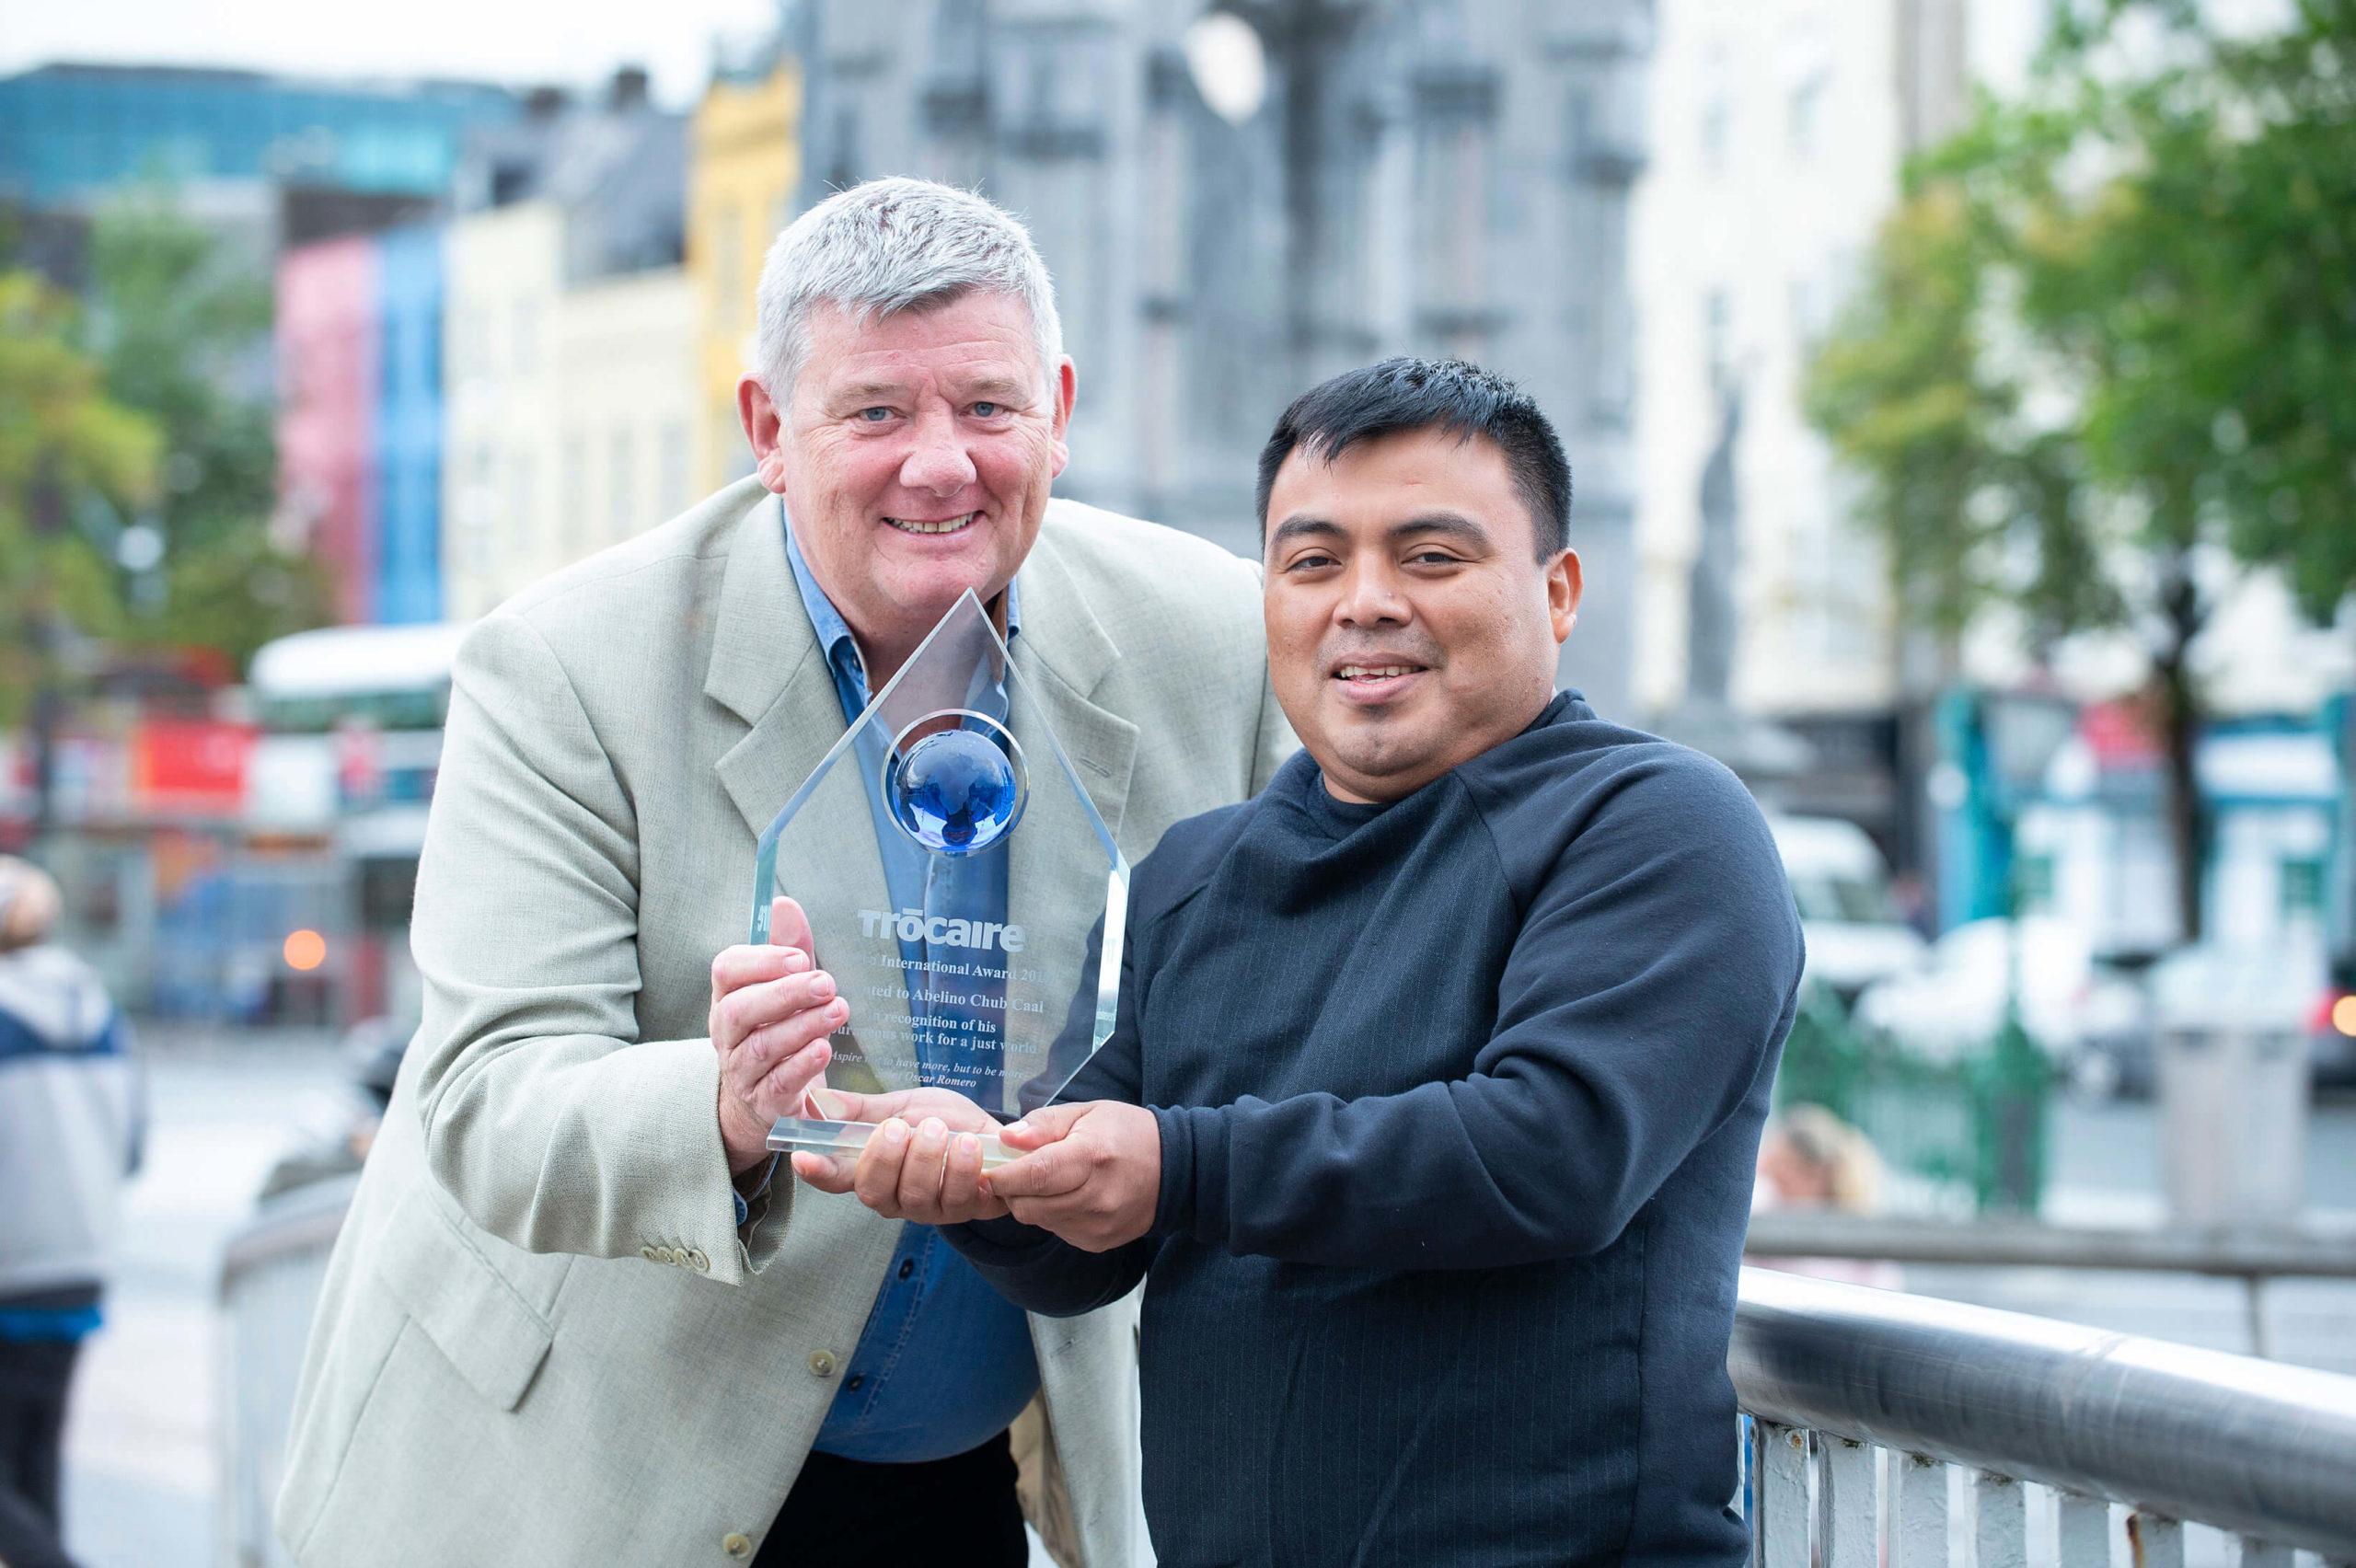 Broadcaster John Creedon presents Guatemalan activist Abelino Chub Caal with Trócaire's Romero International Award in Cork City.    Photo: Gerard McCarthy/Trócaire.